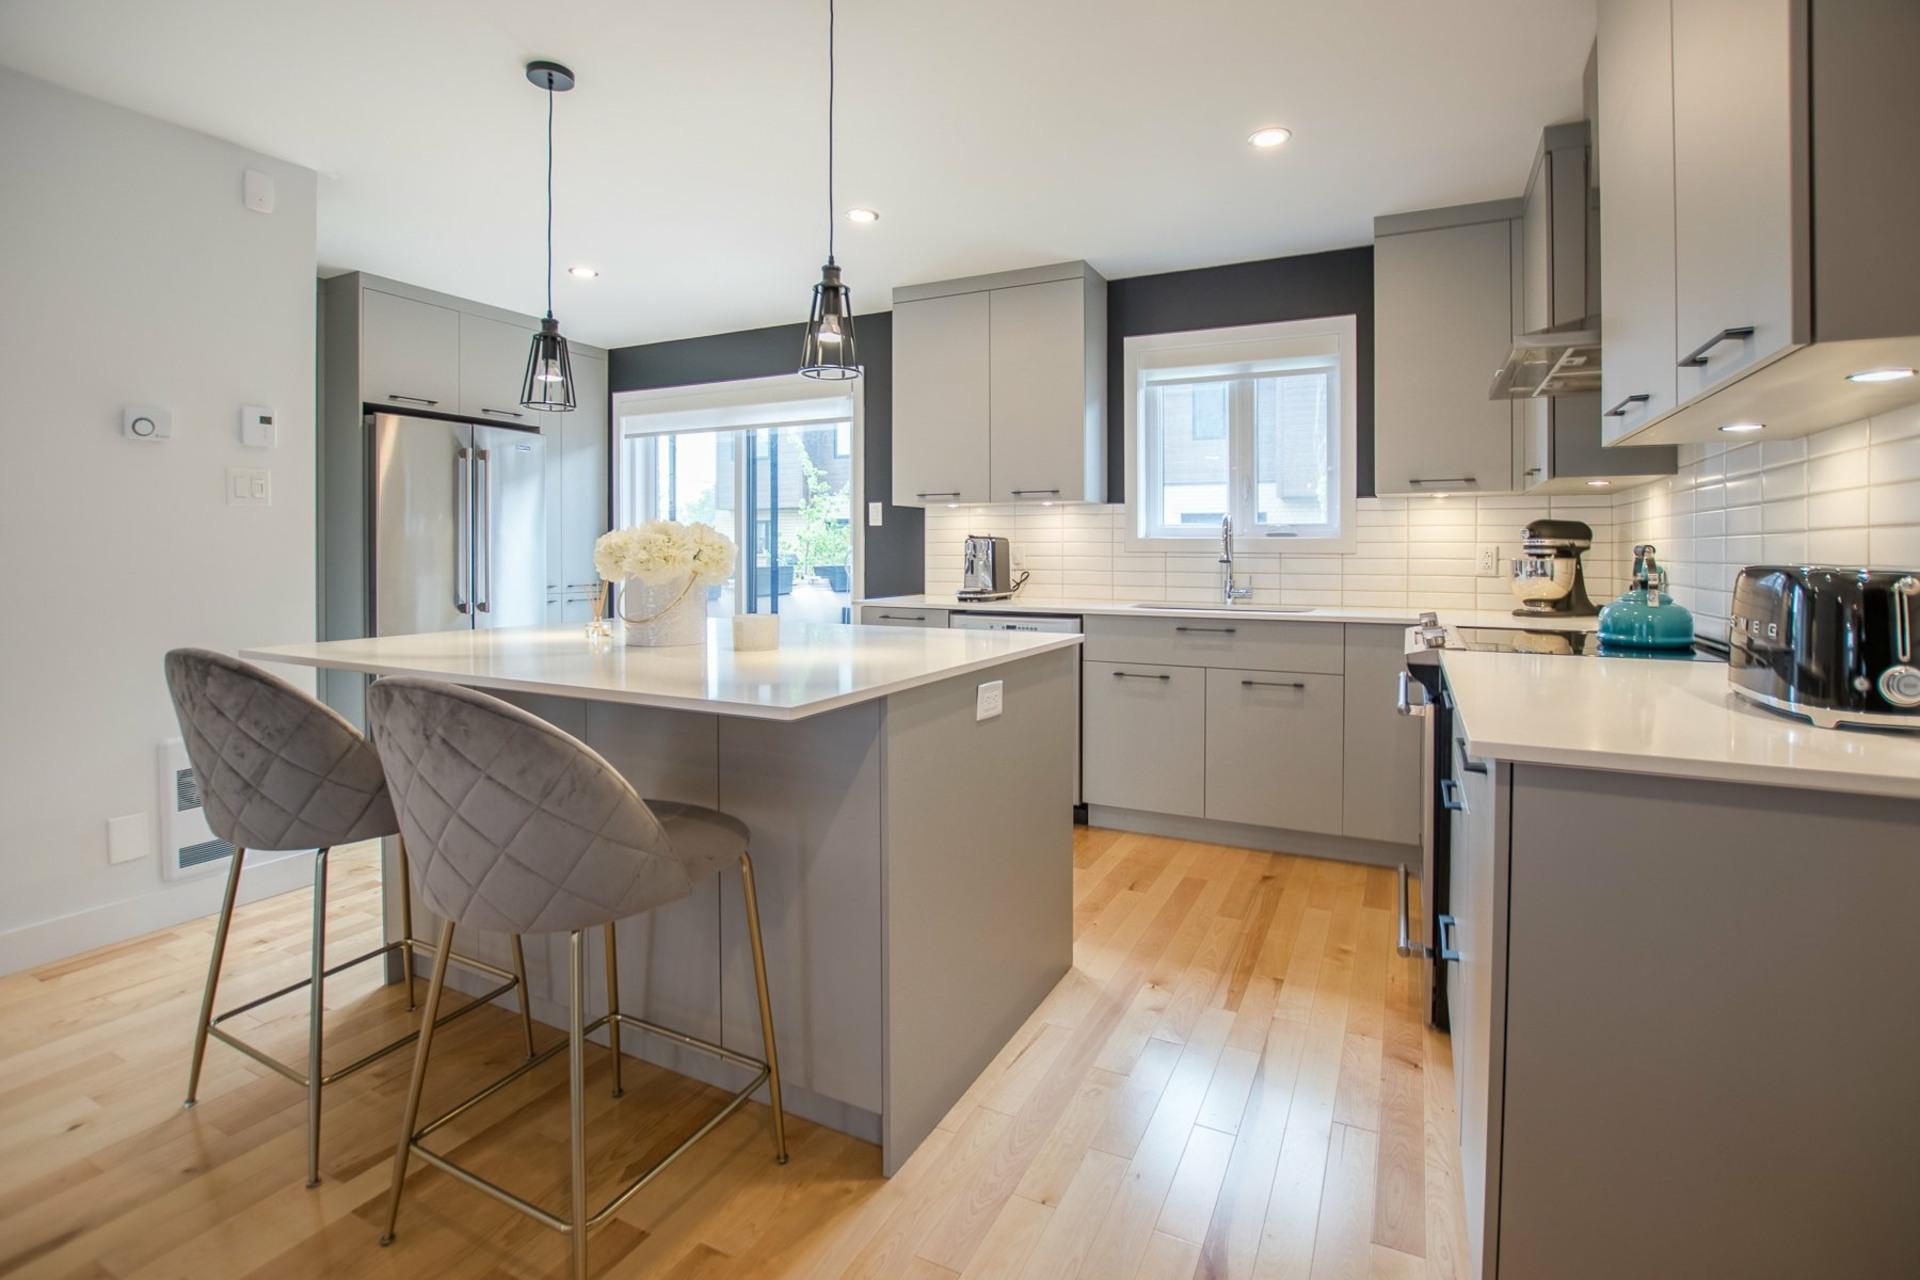 image 2 - MX - Casa sola - MX En venta Saint-Constant - 10 habitaciones